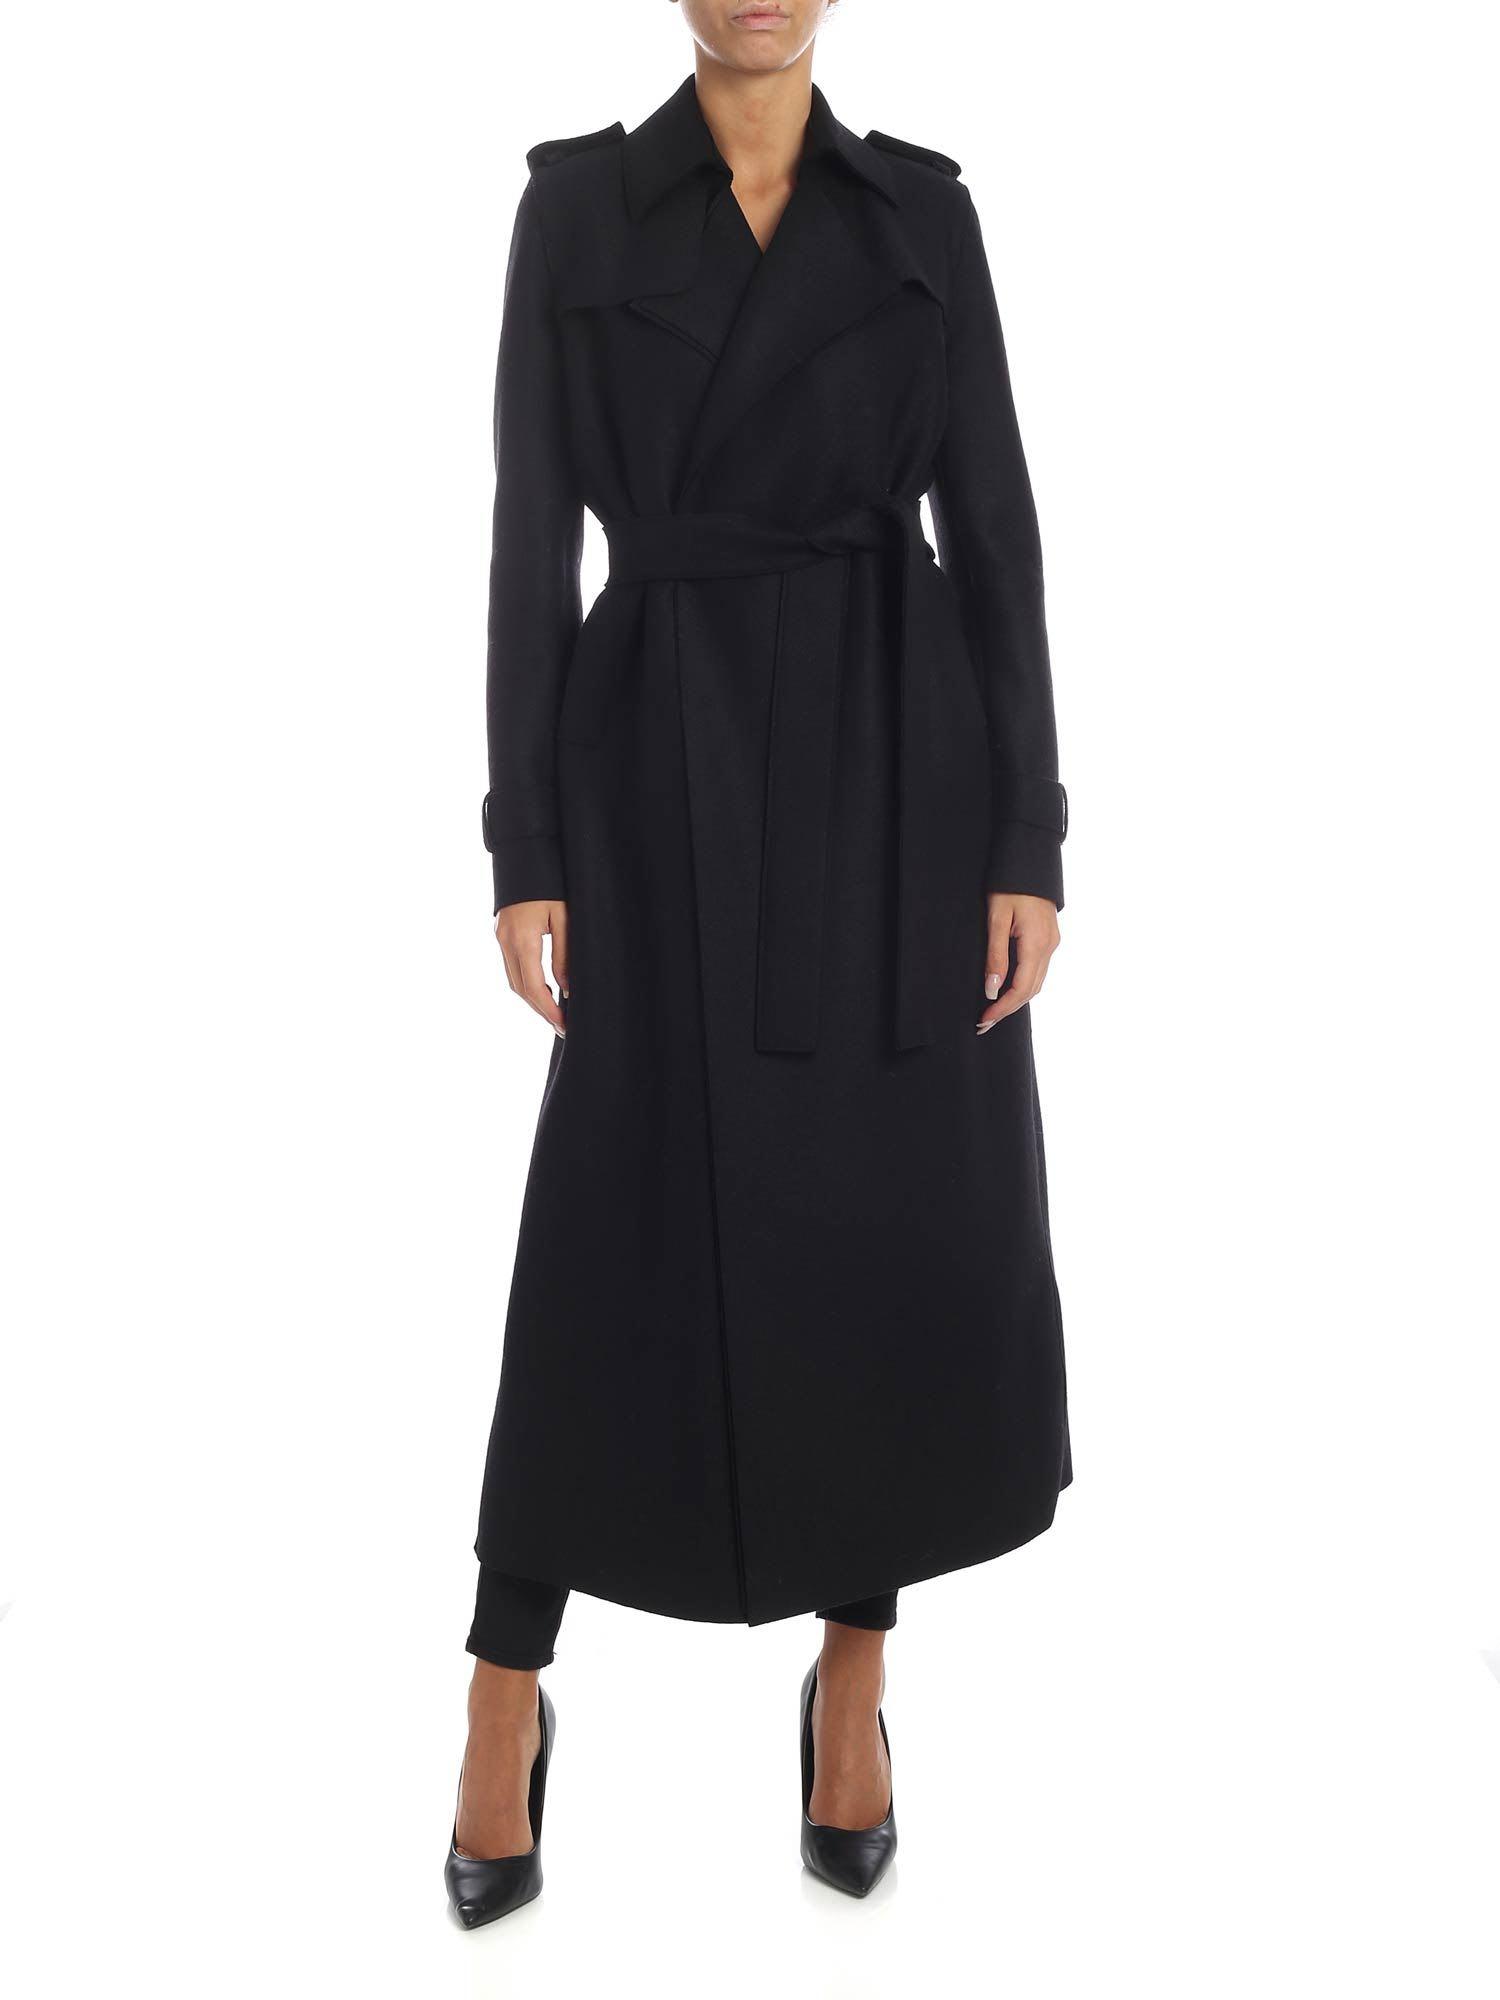 Harris Wharf London – Double Layer Coat